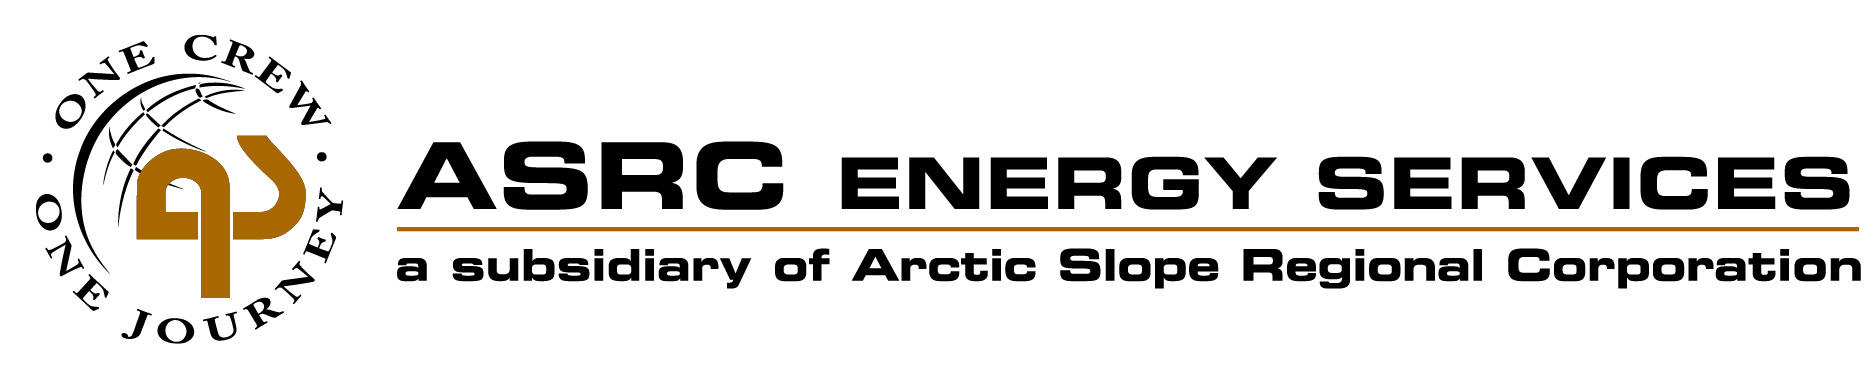 ASRC Energy Logo.jpg